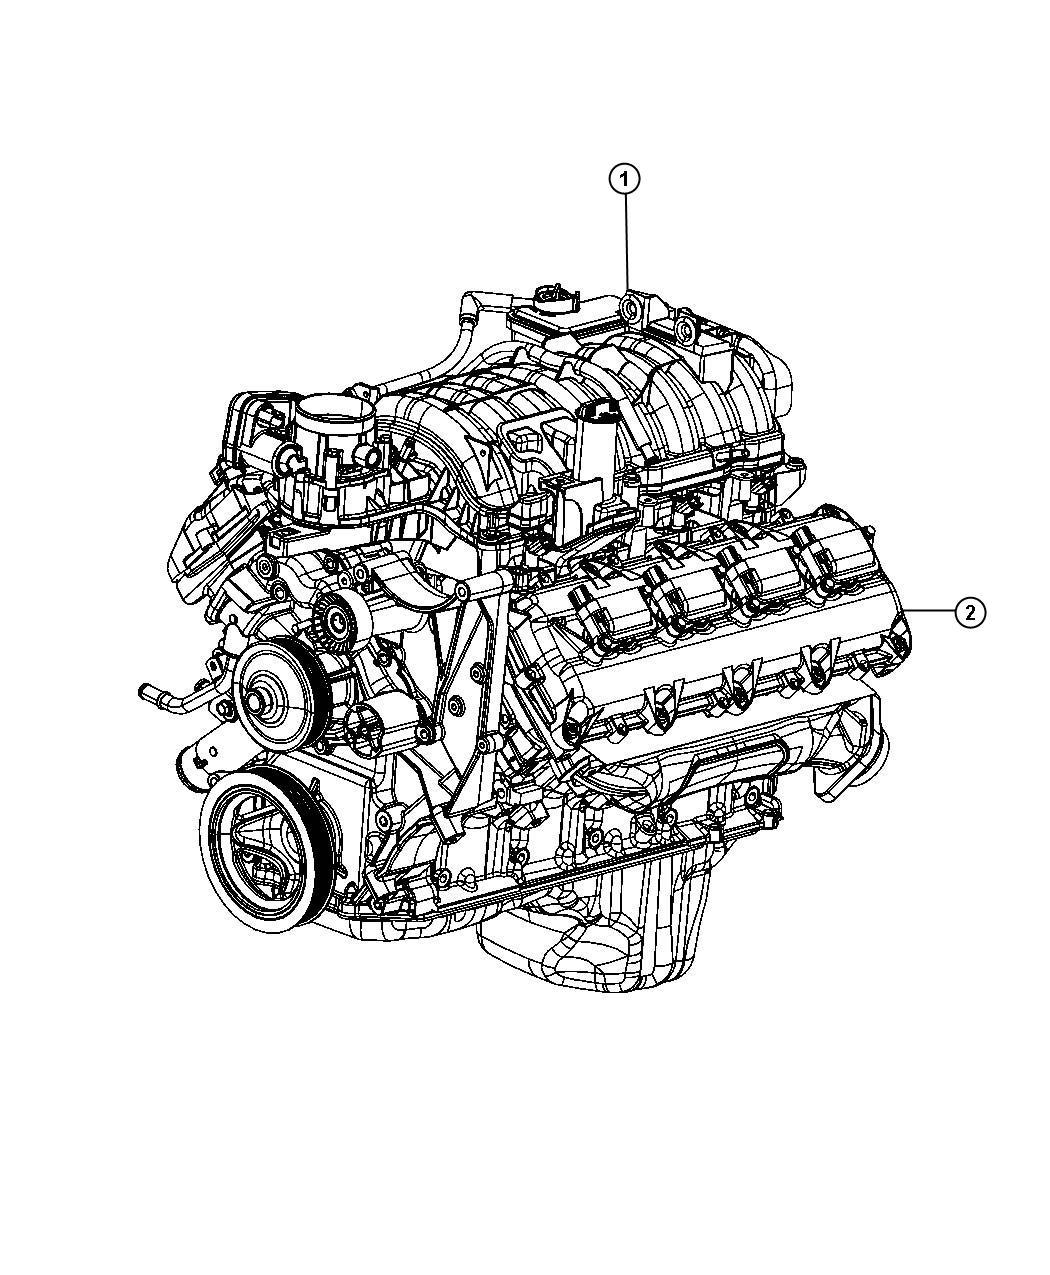 Gmc 5 7l V8 Engine Diagram